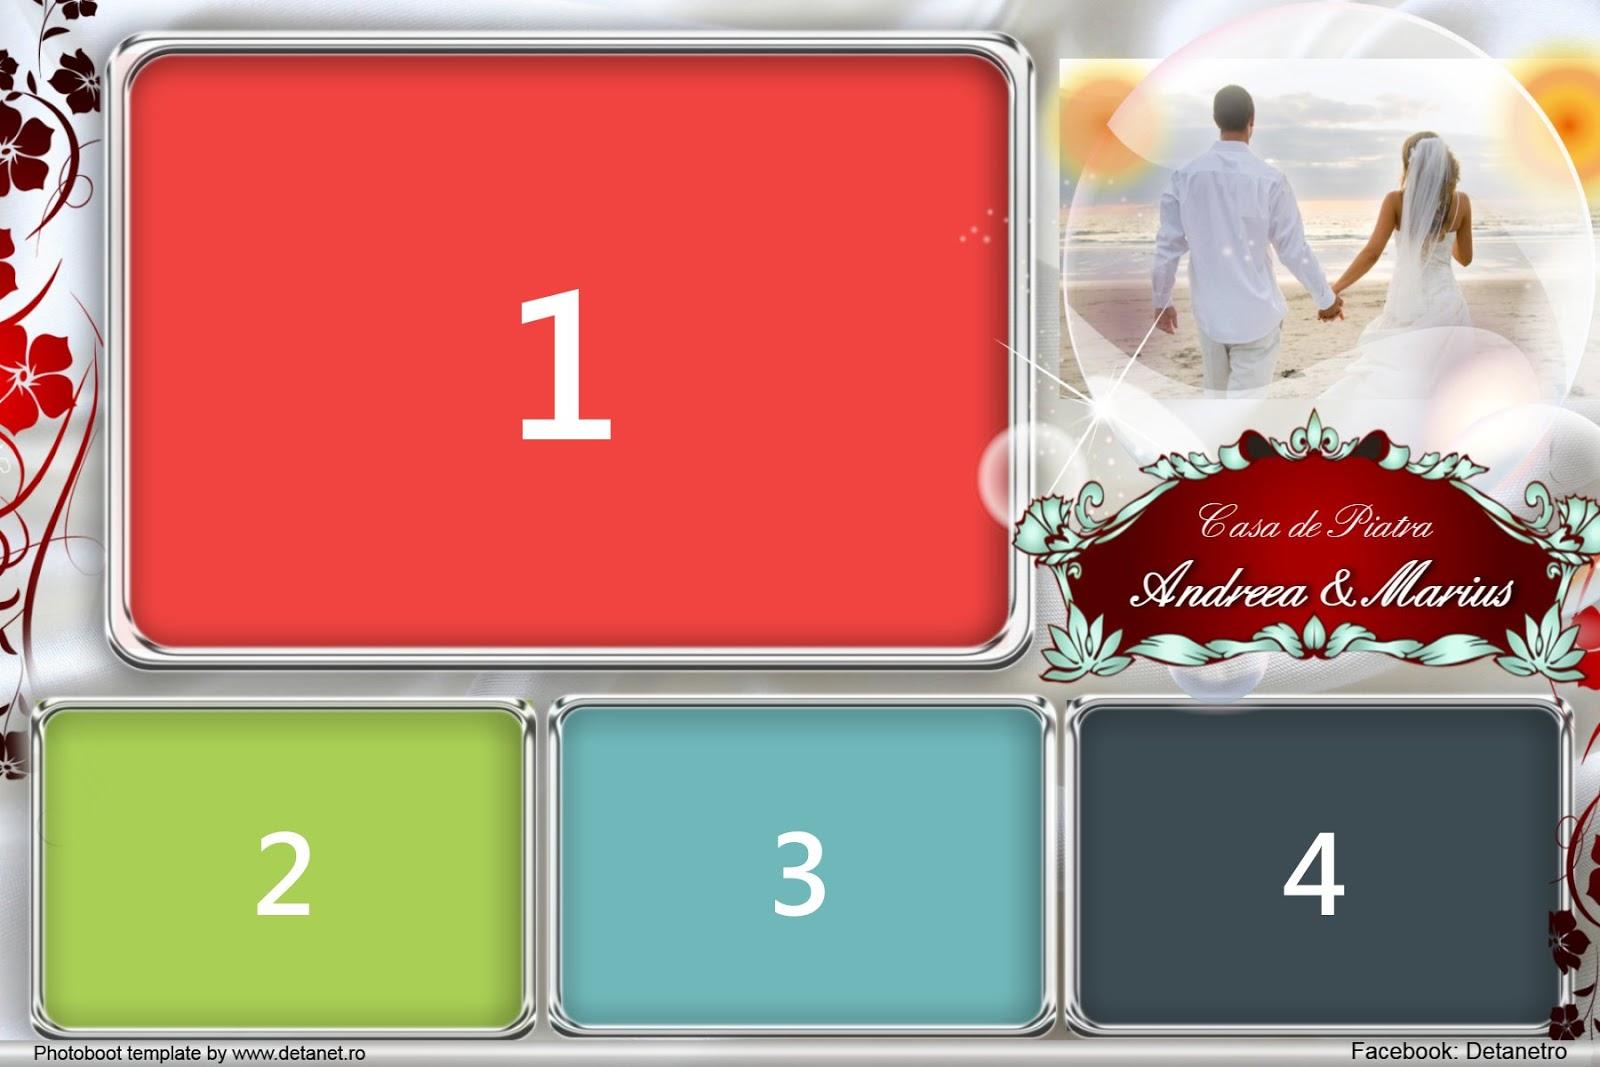 Download Template Photobooth Wedding Dslrbooth Detanet